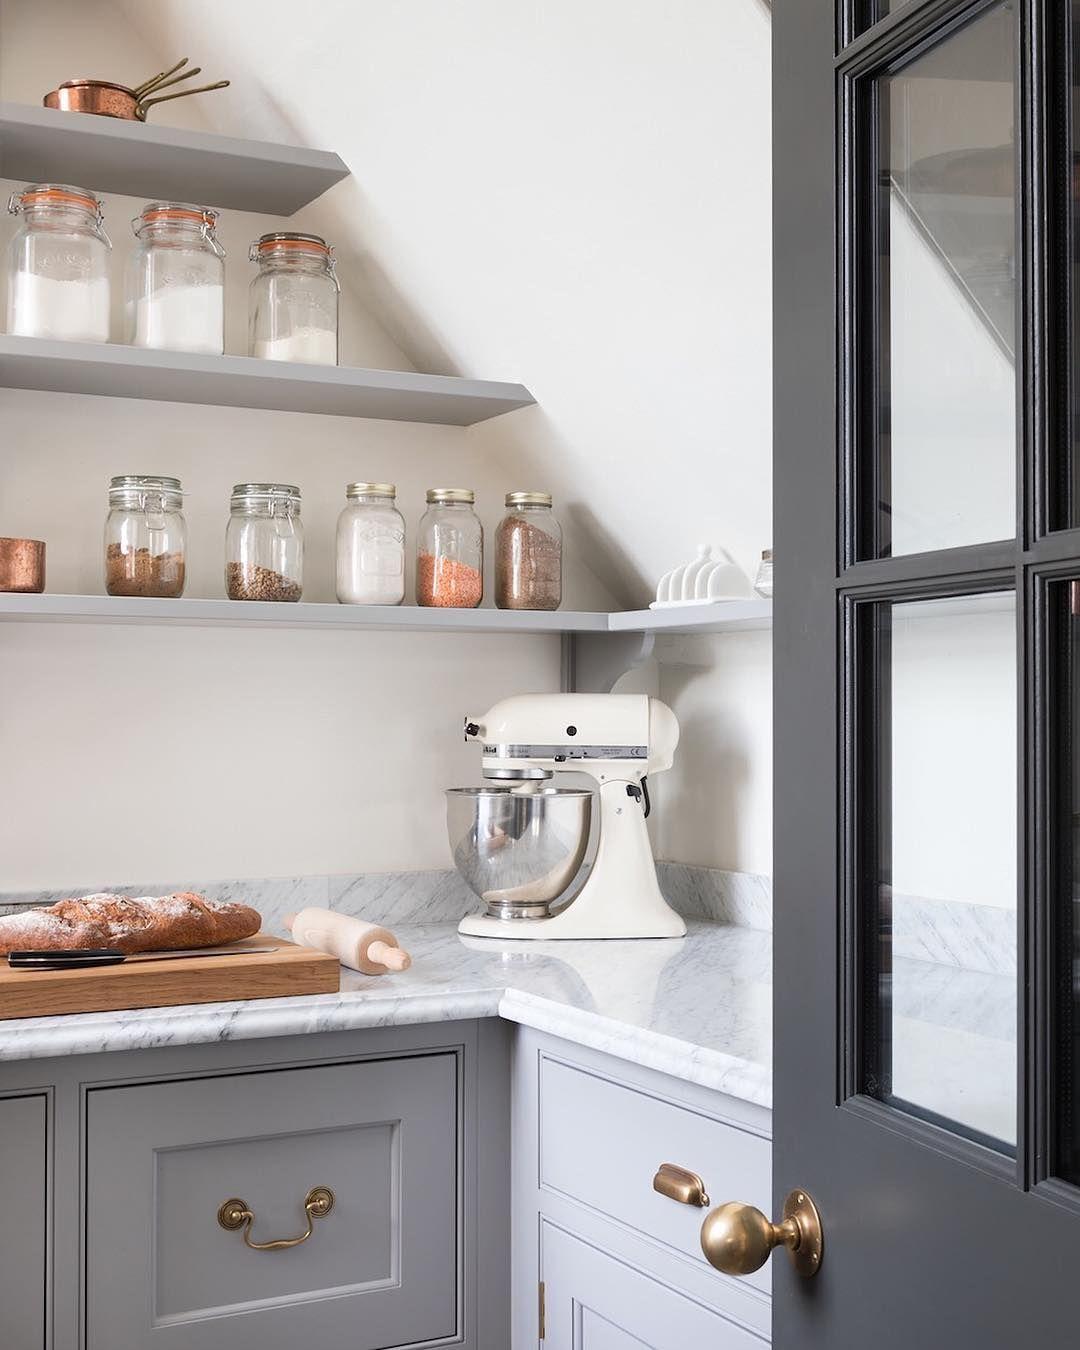 humphrey munson pantry stairs in kitchen under stairs pantry kitchen inspirations on kitchen under stairs id=85690